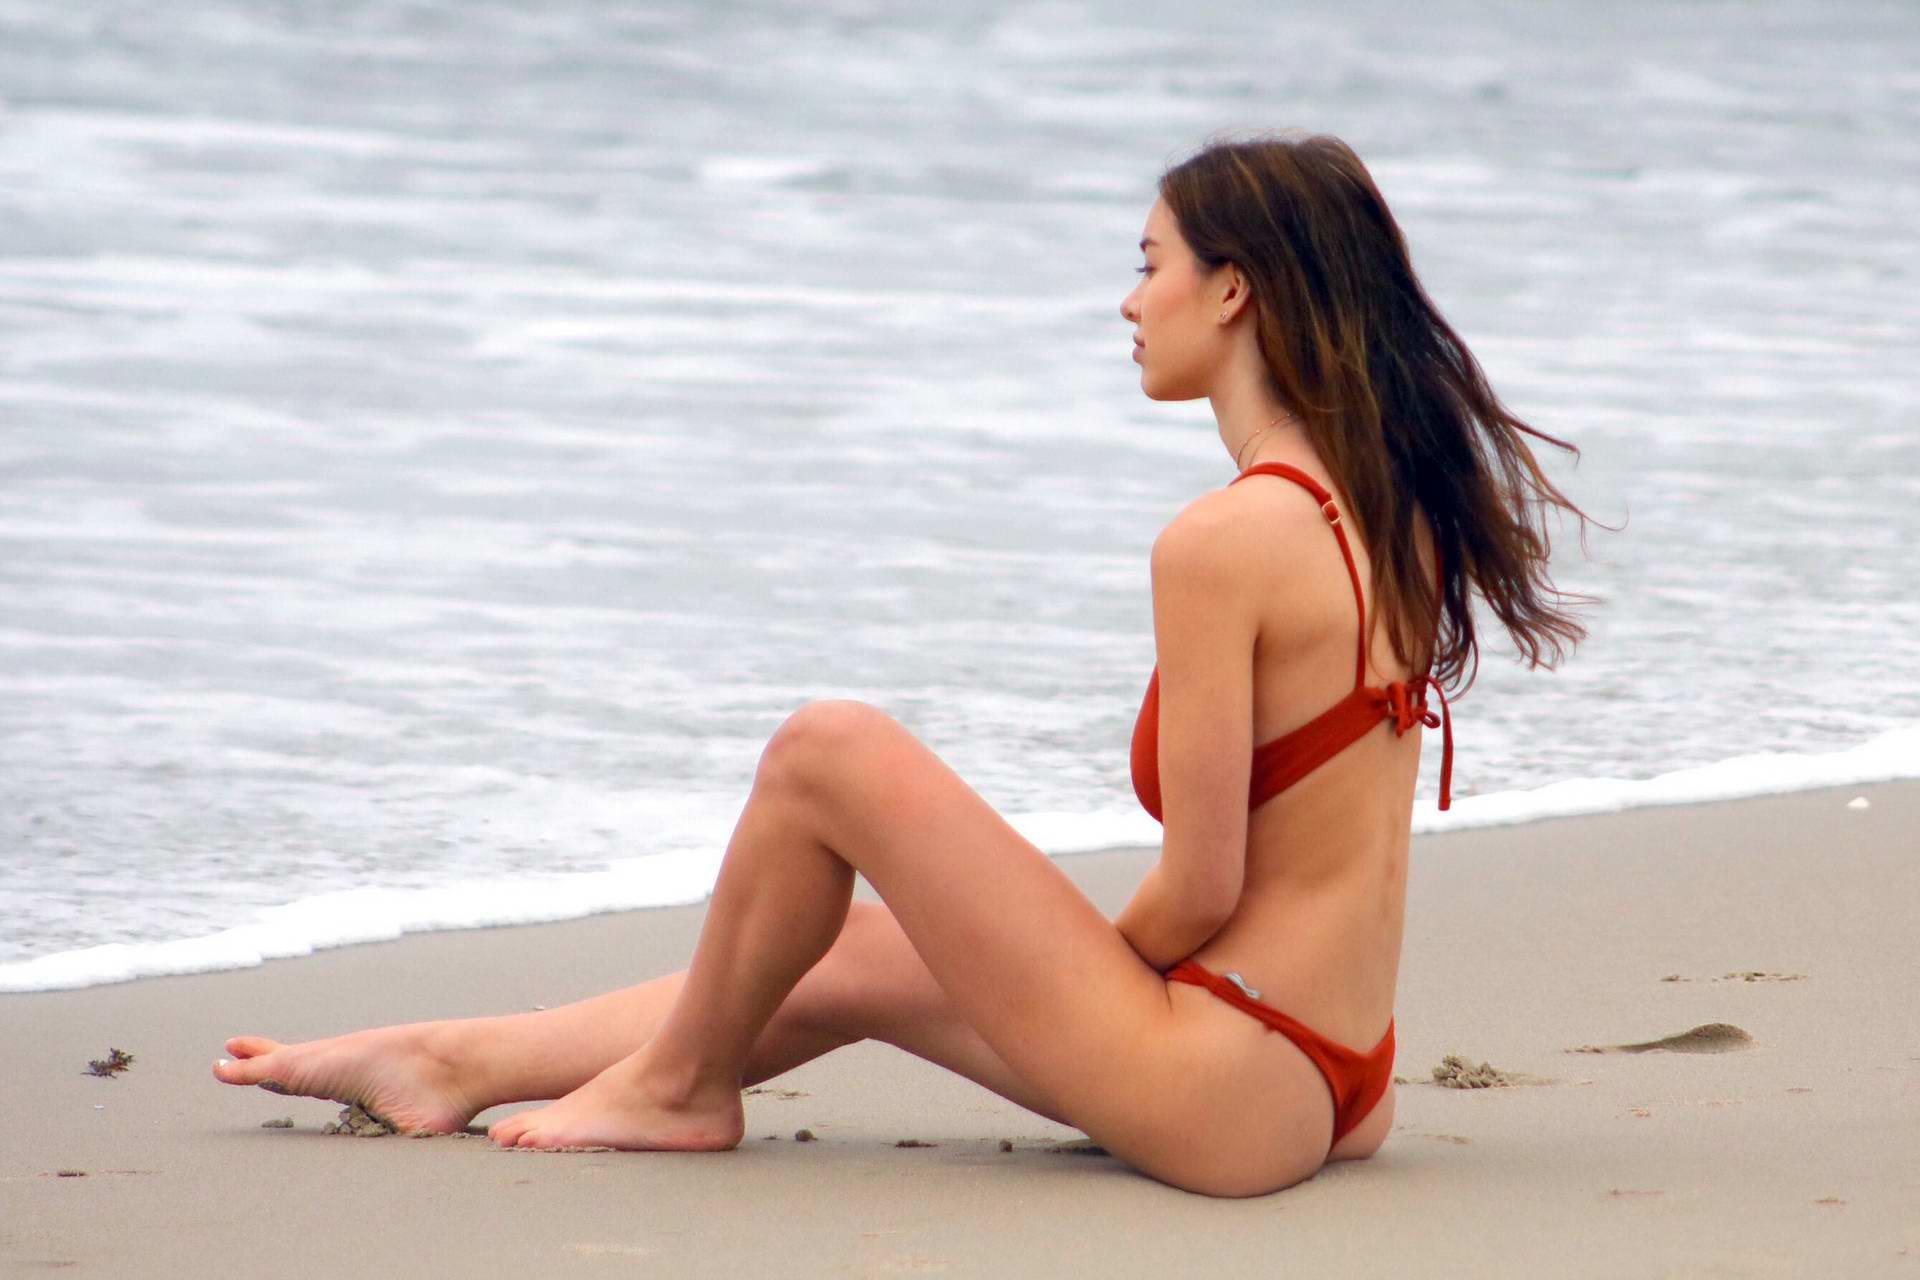 Celebrites Sophie Mudd nudes (26 photos), Tits, Paparazzi, Boobs, lingerie 2019